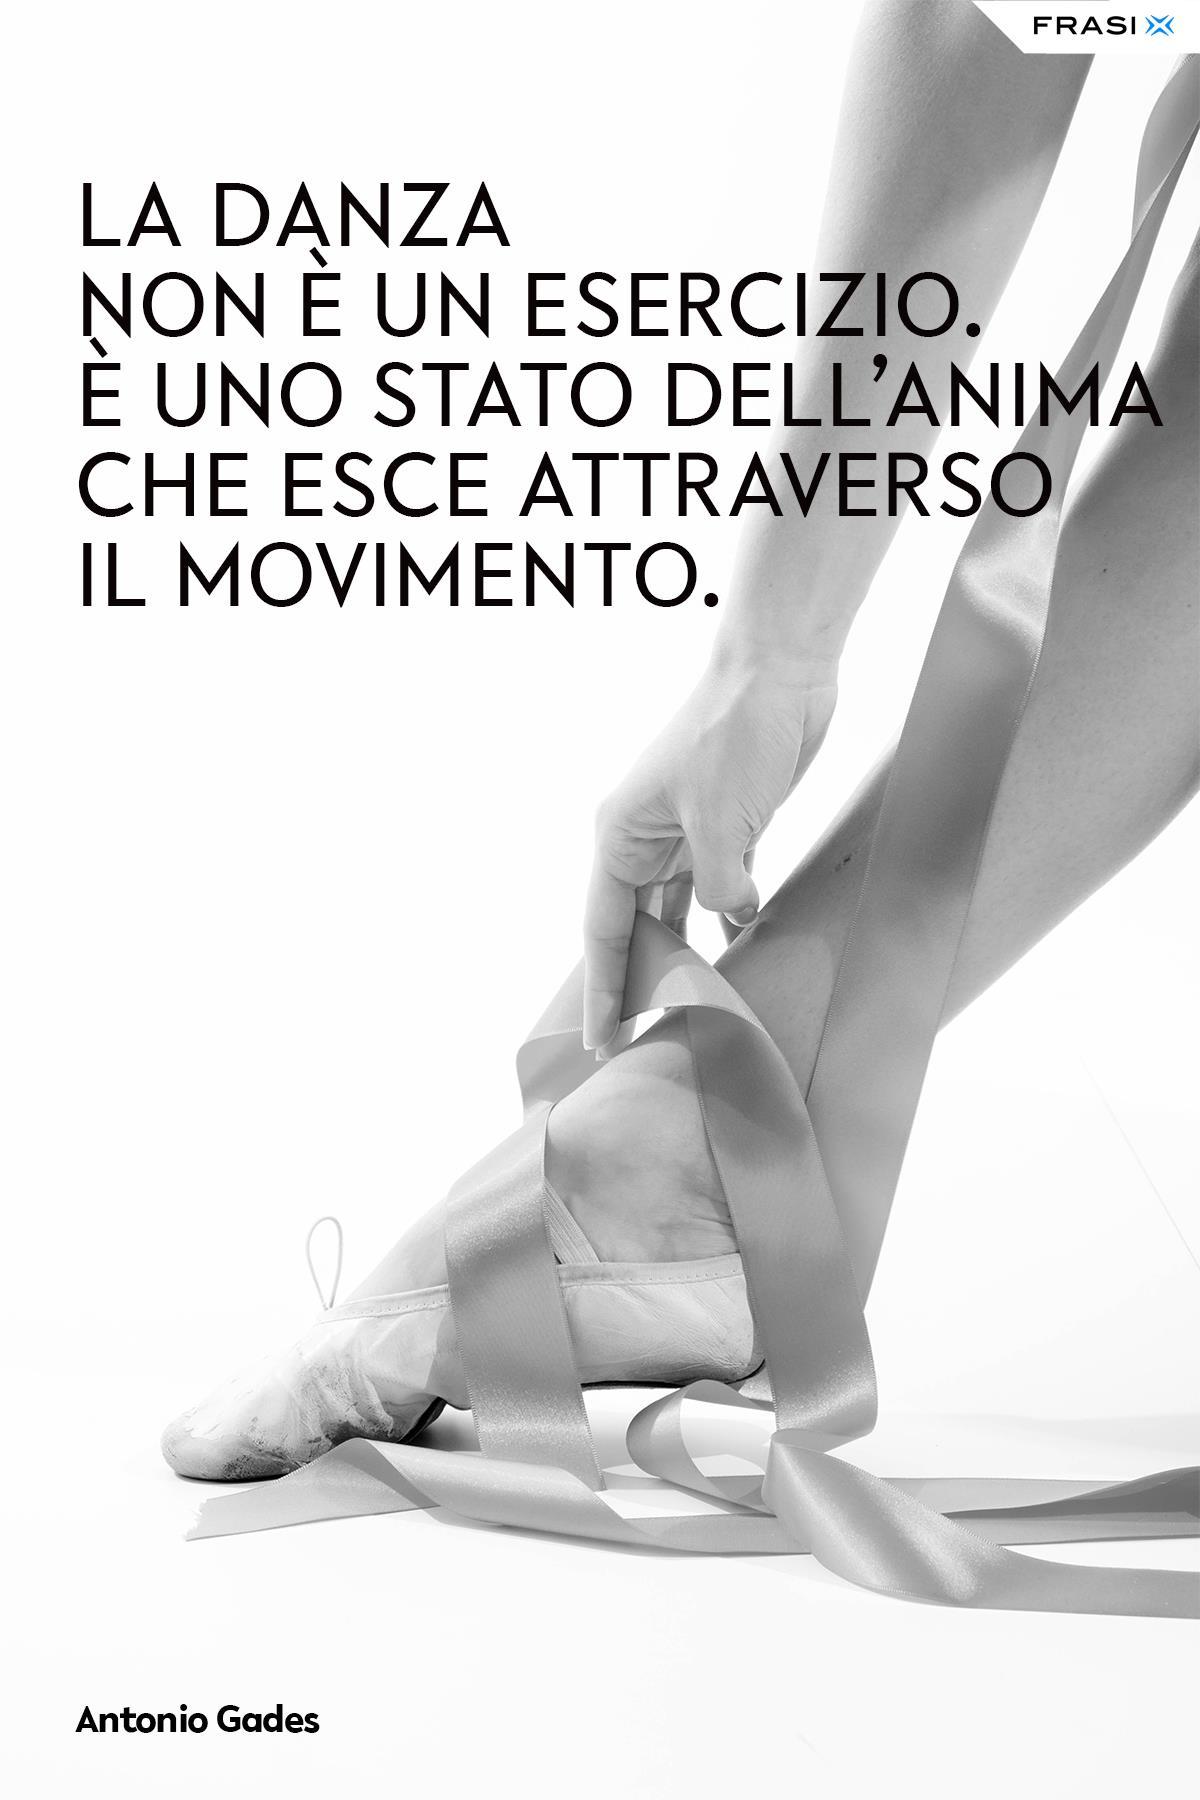 Frasi su danza esercizio Antonio Gades